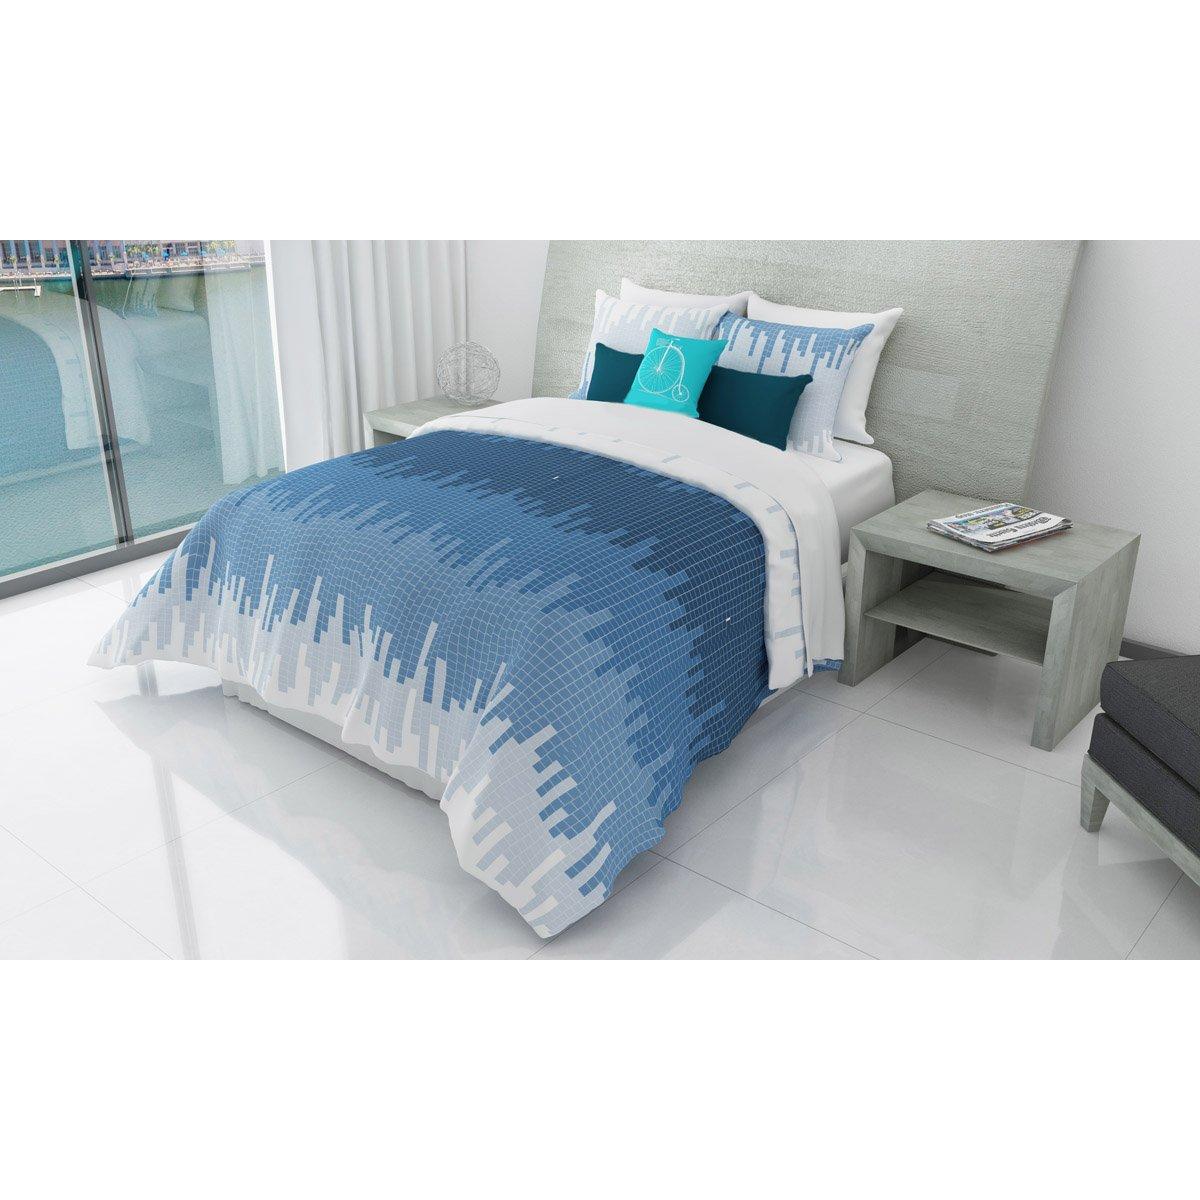 Paquete de cama cadre home nature matrimonial queen for Imagenes de cama queen size